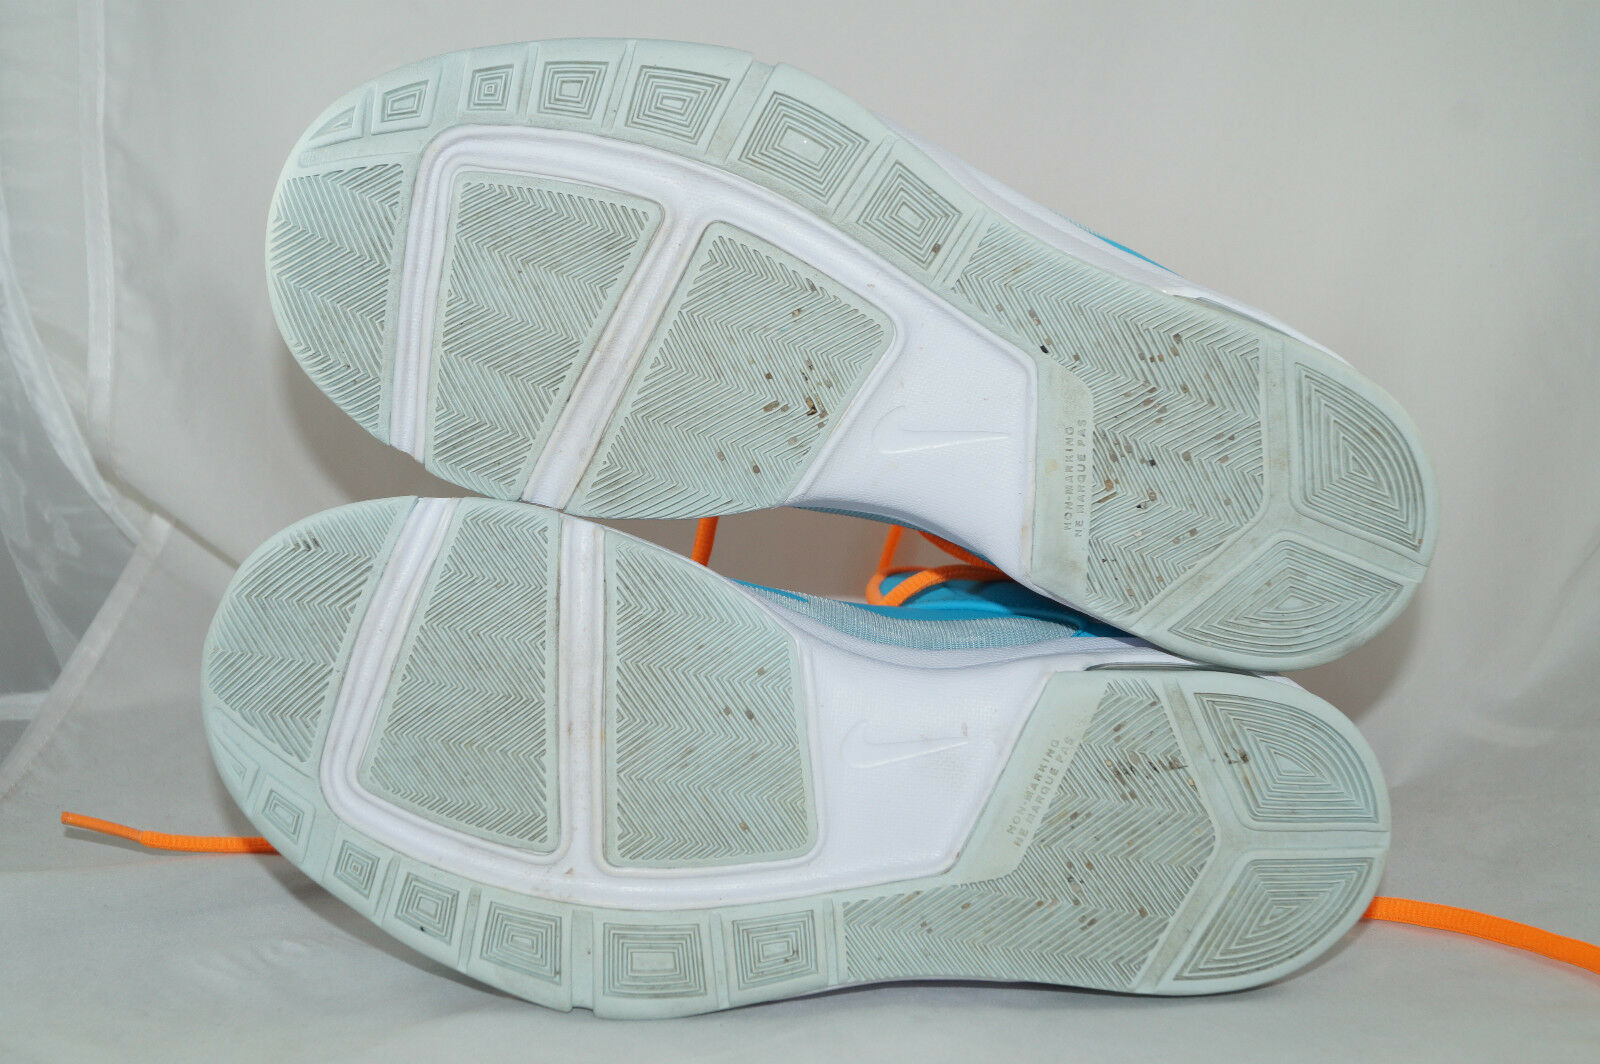 Nike Air zoom KD V elite GR GR GR  38,5 High Tops azul claro calzado deportivo ce49cc